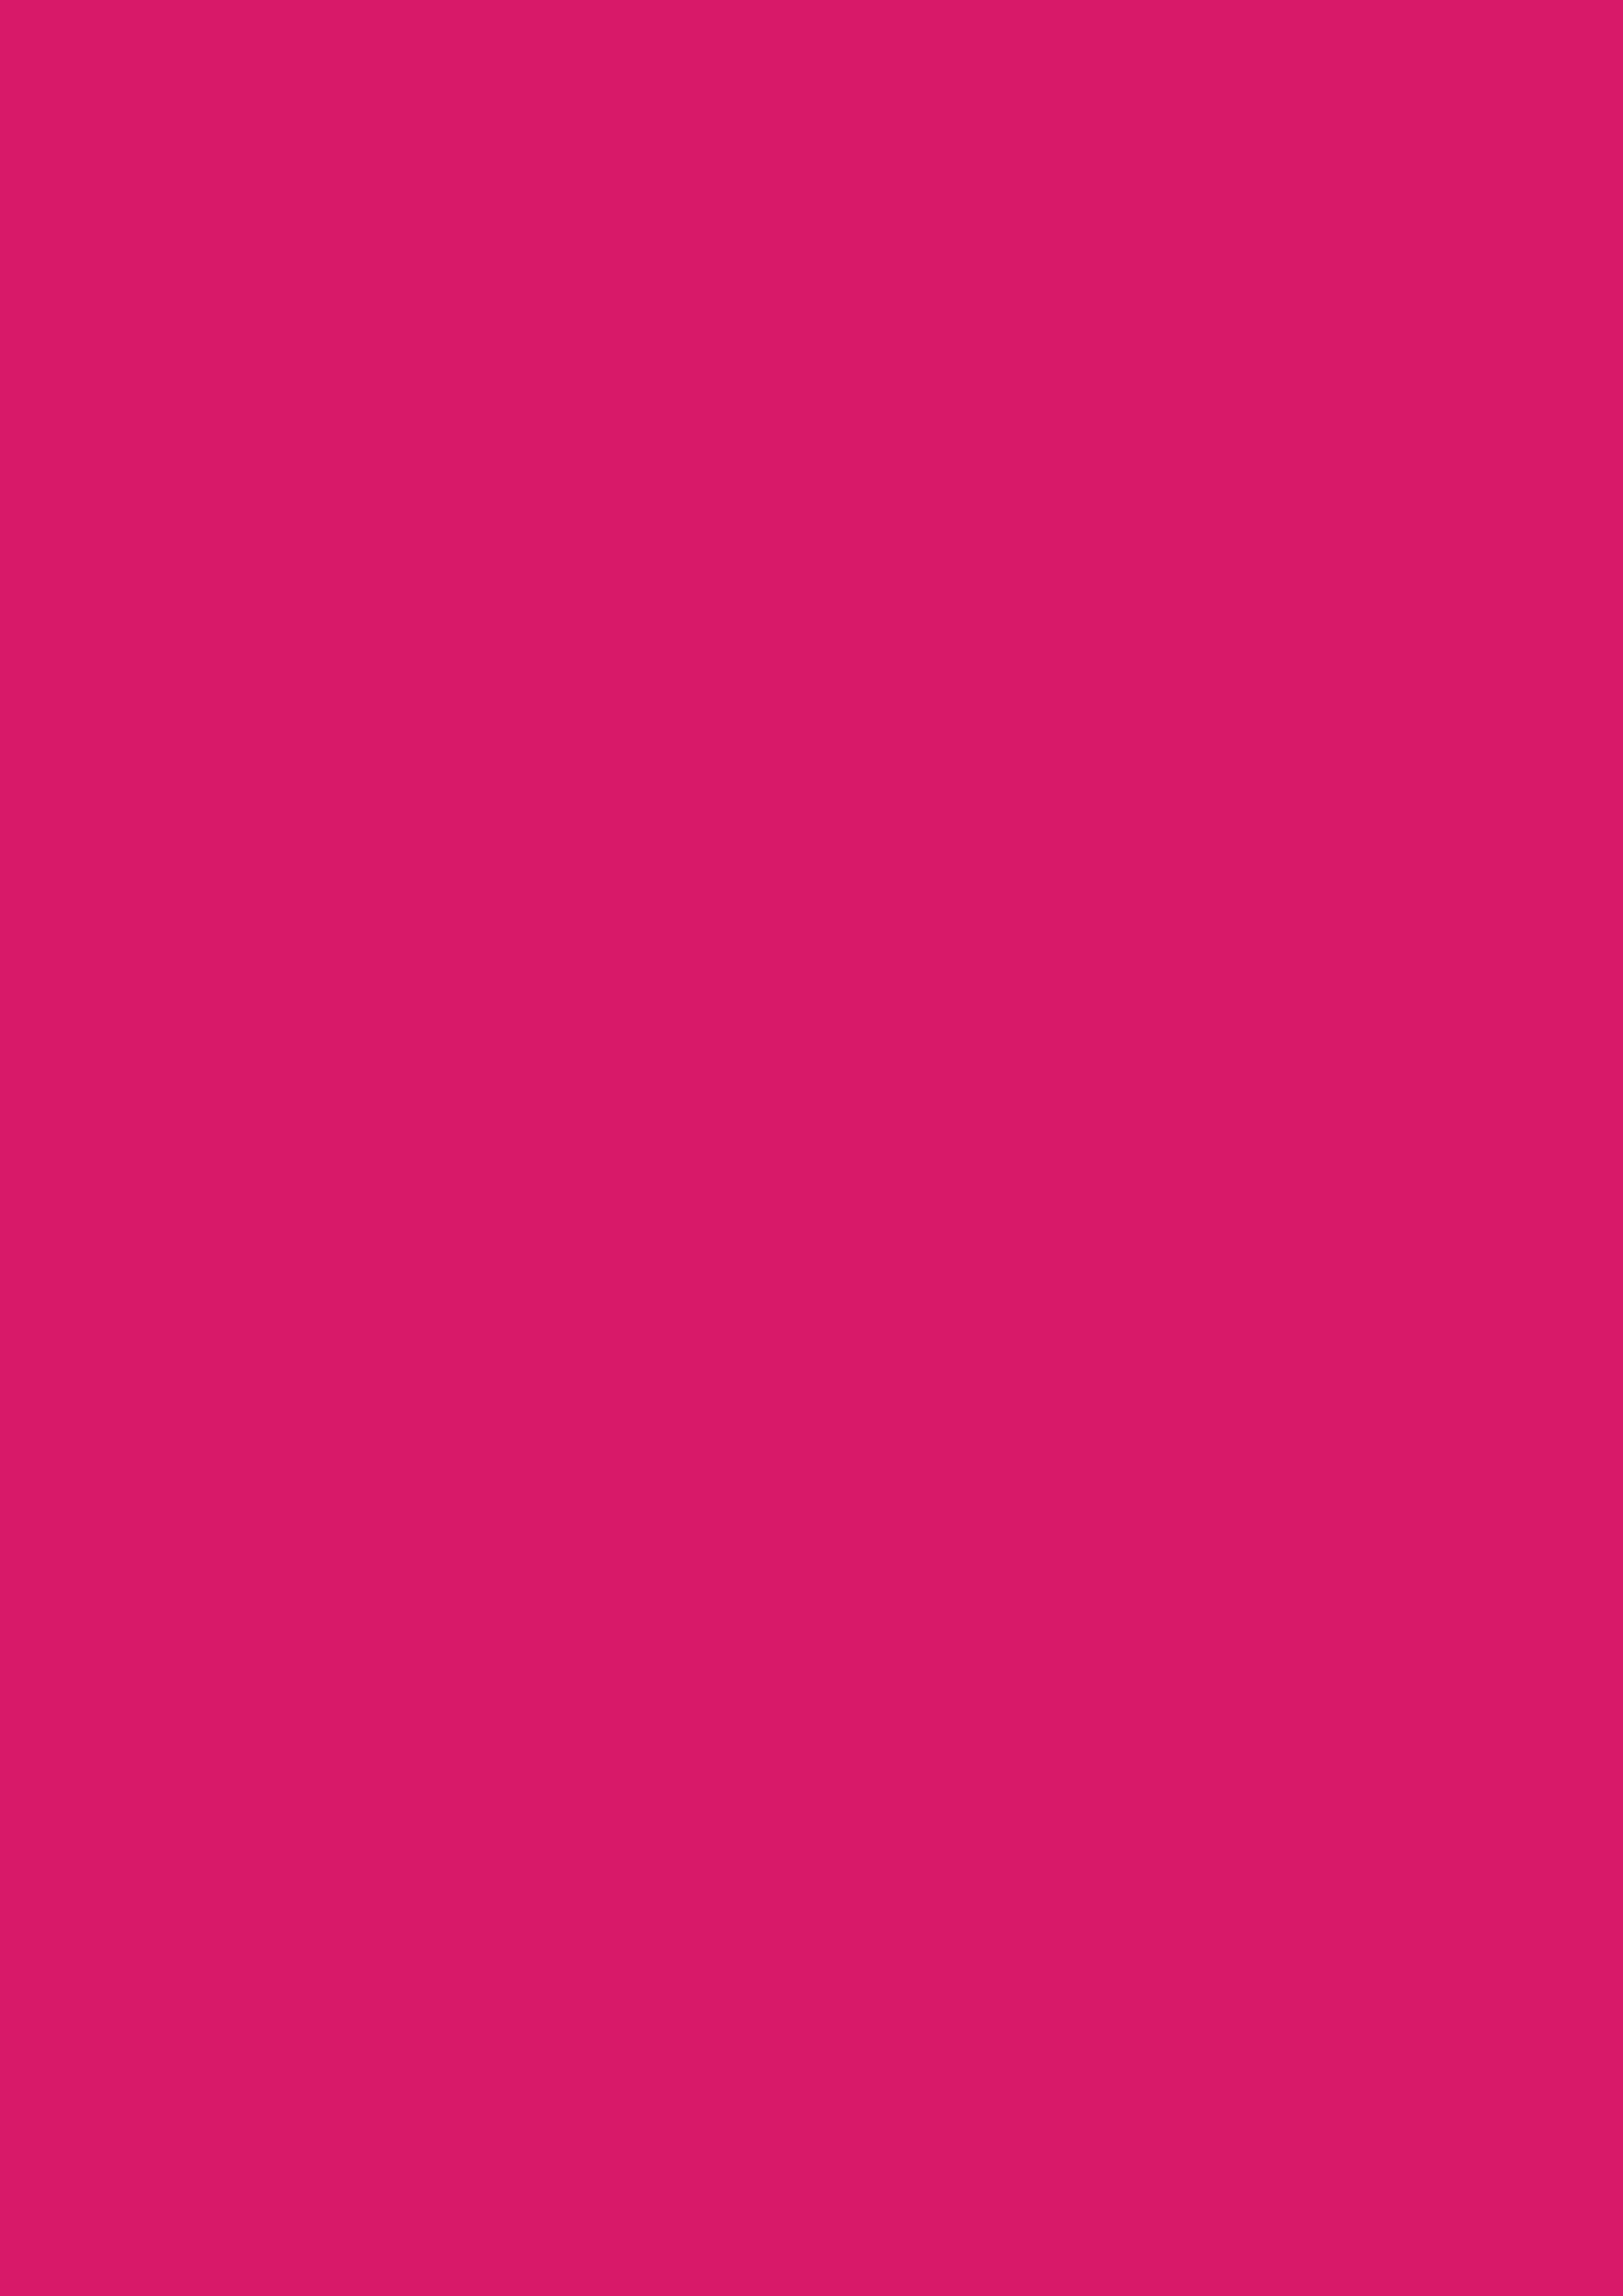 2480x3508 Dogwood Rose Solid Color Background